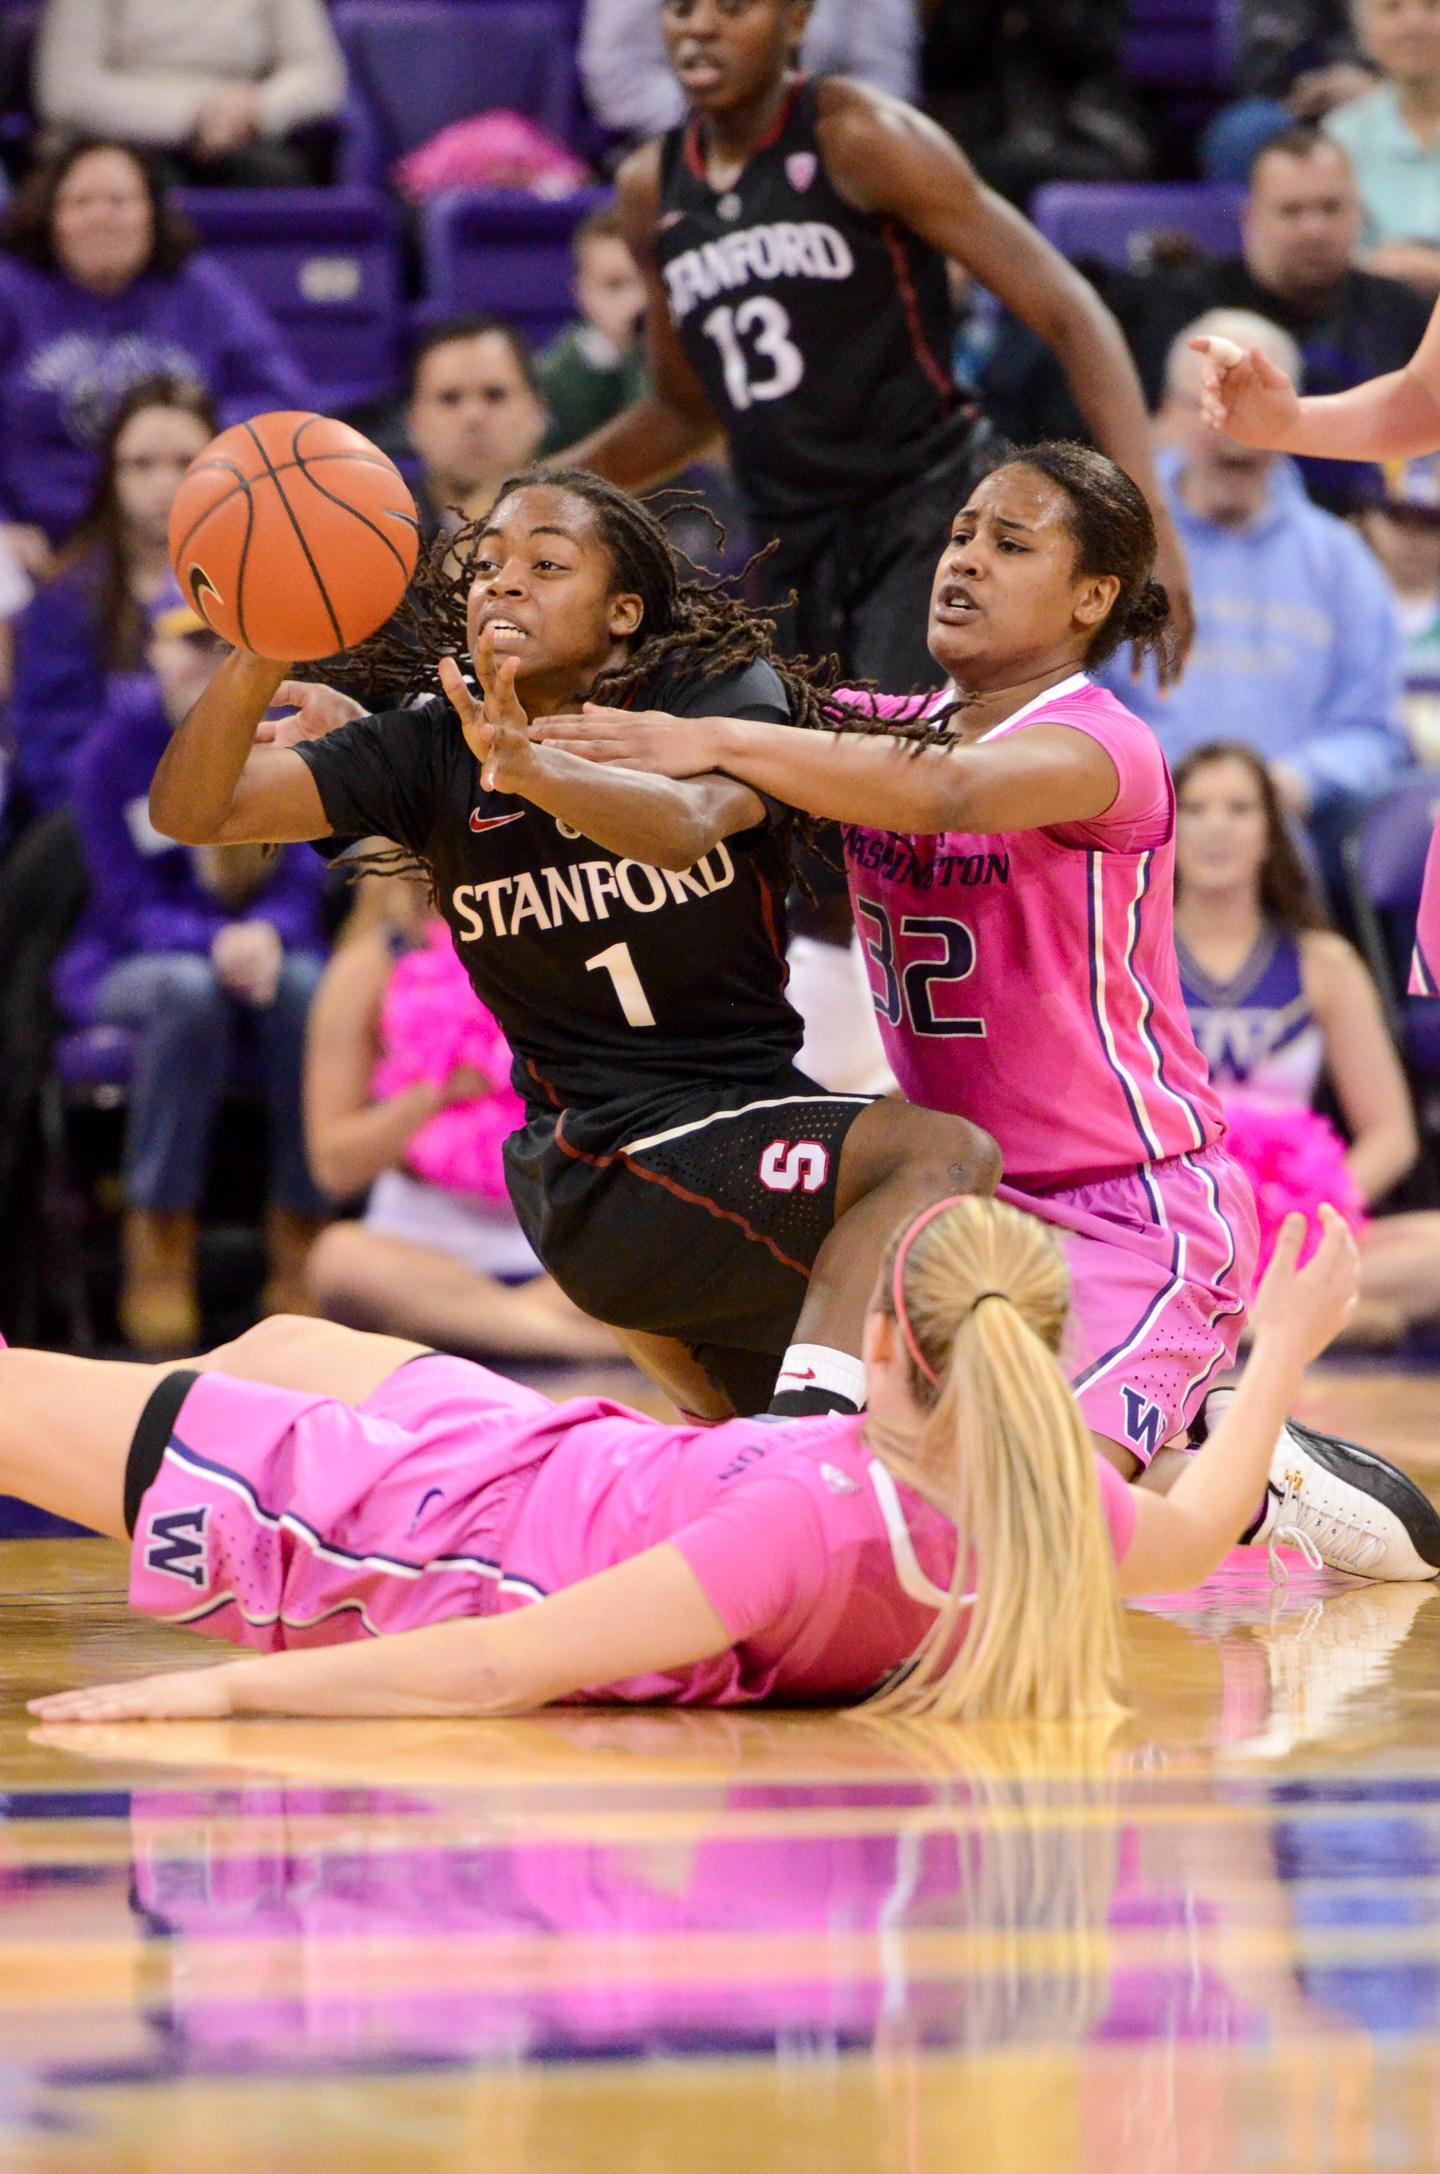 University of Washington Huskies Women's Basketball Point Guard Jazmine Davis Fighting for Ball